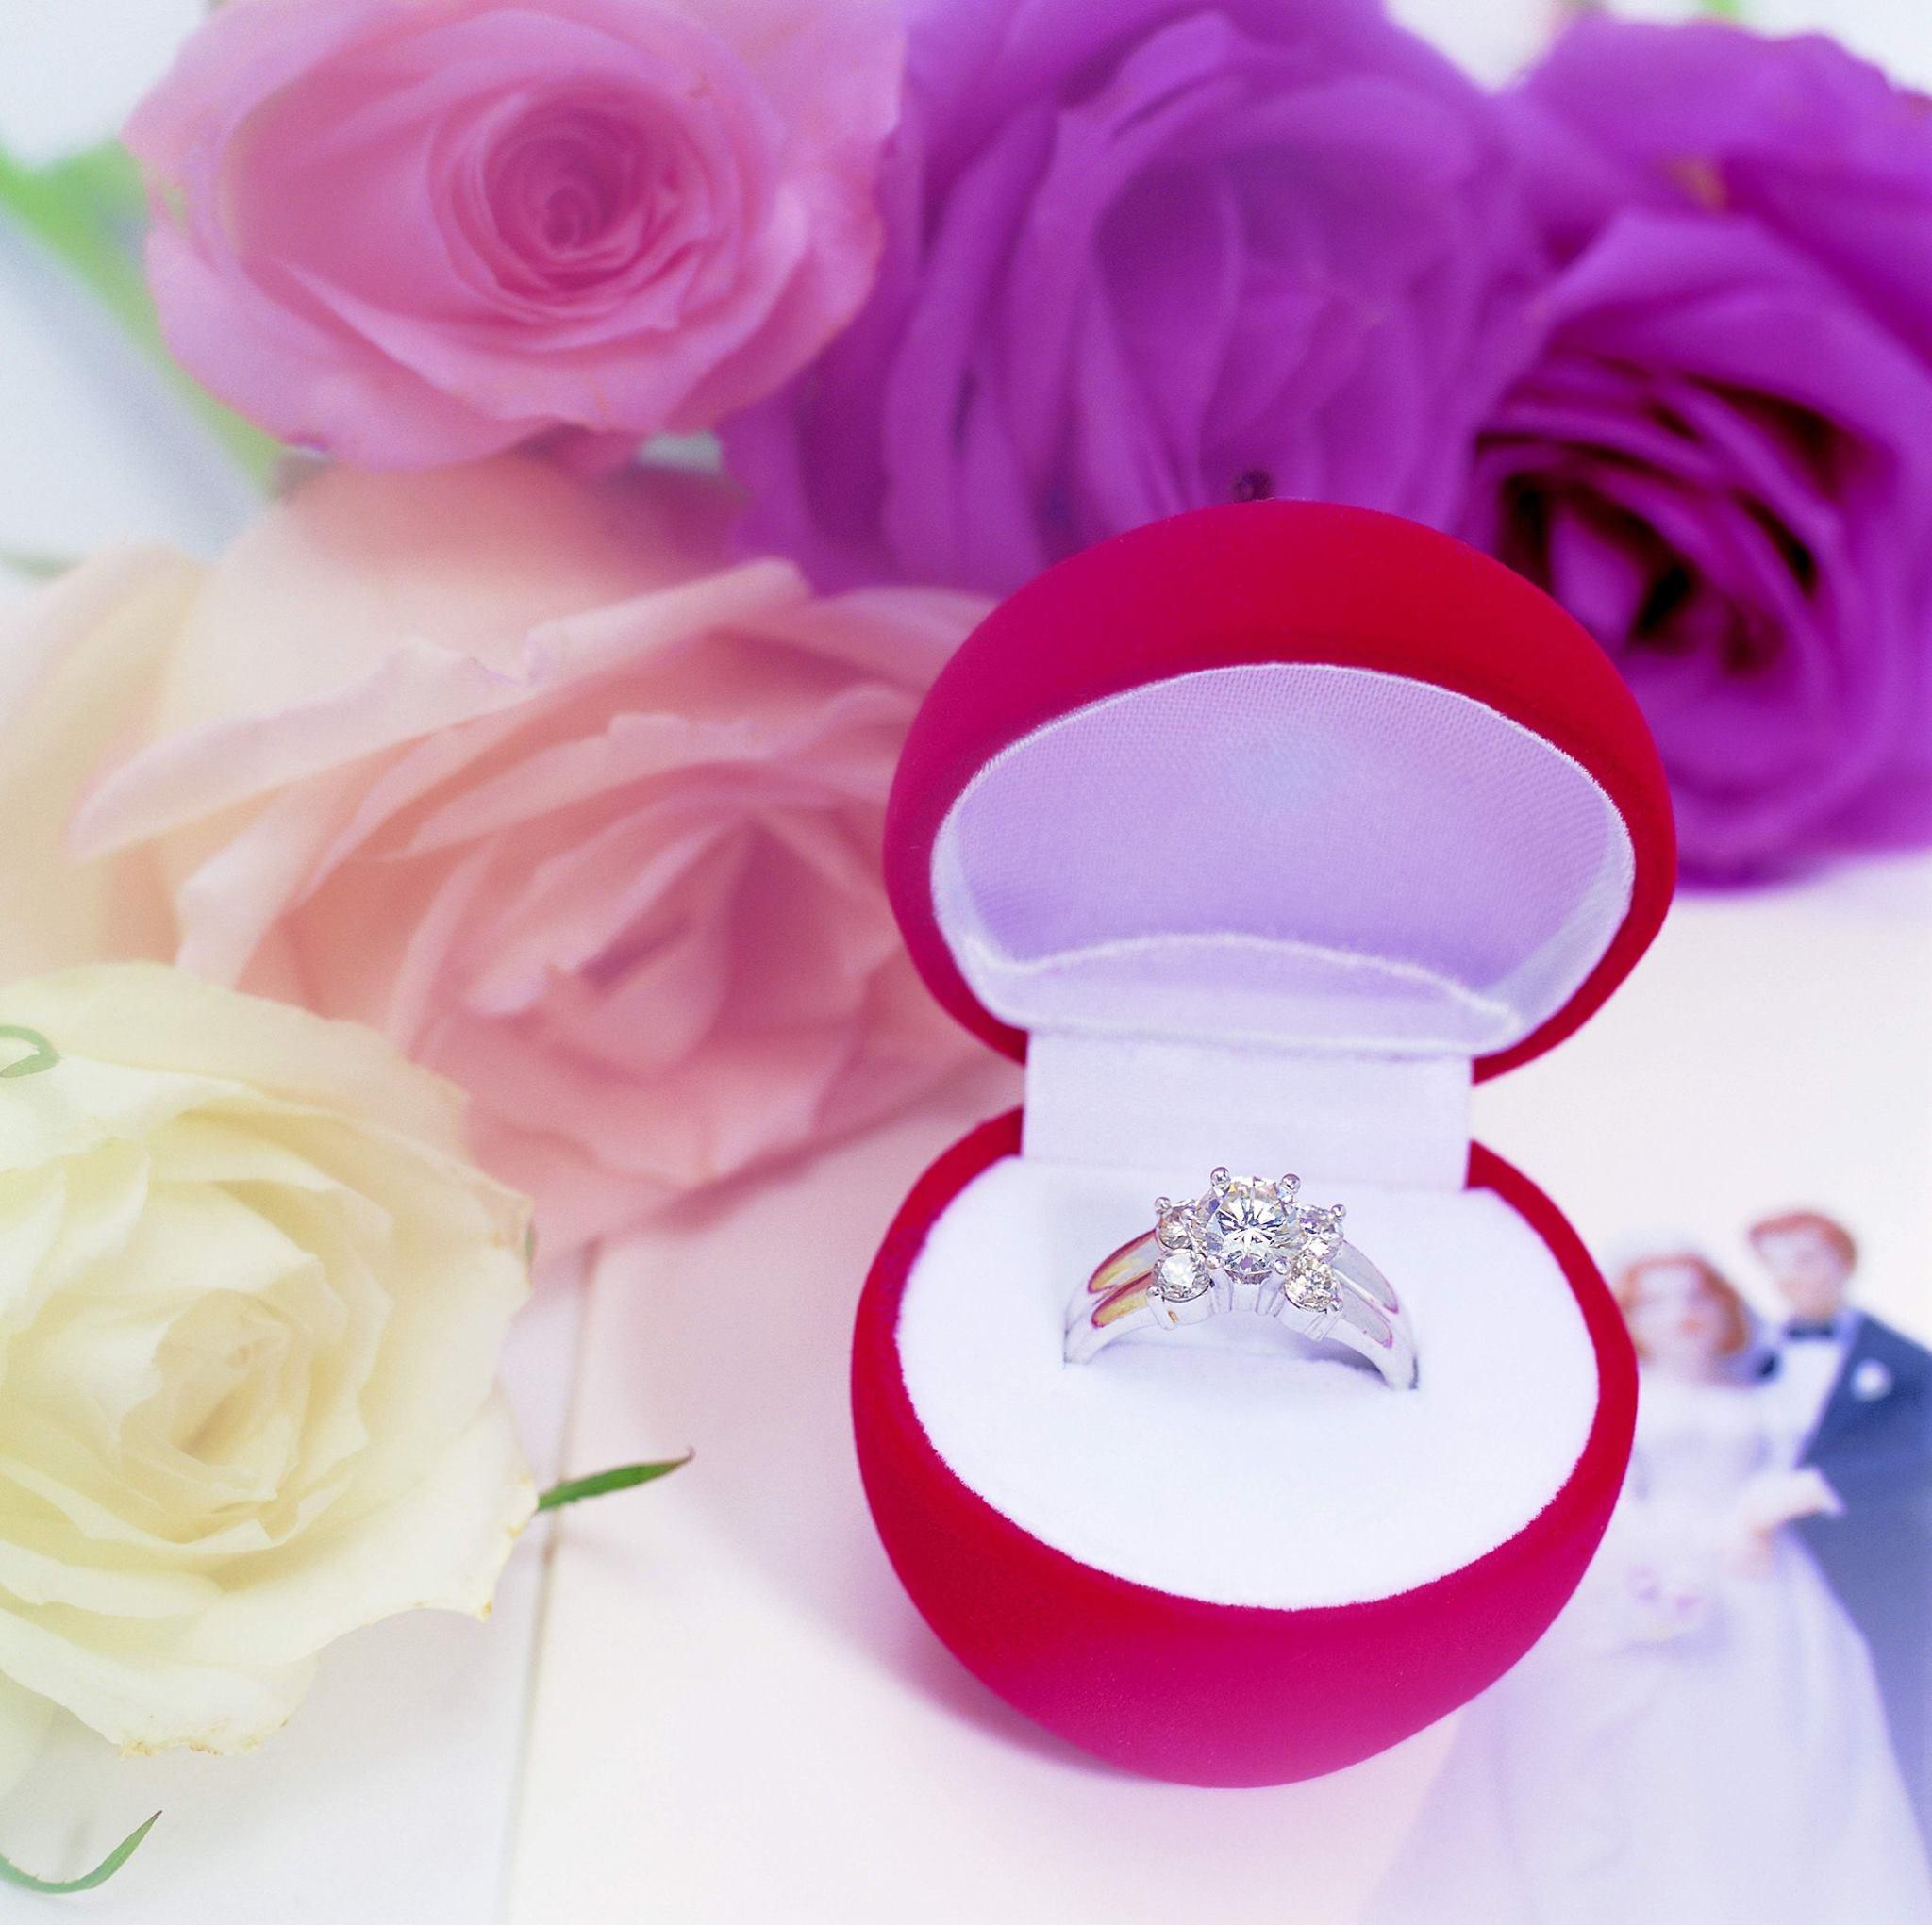 صور عريس وعروسه يوم الزفاف 3 صور عريس وعروسه يوم الزفاف